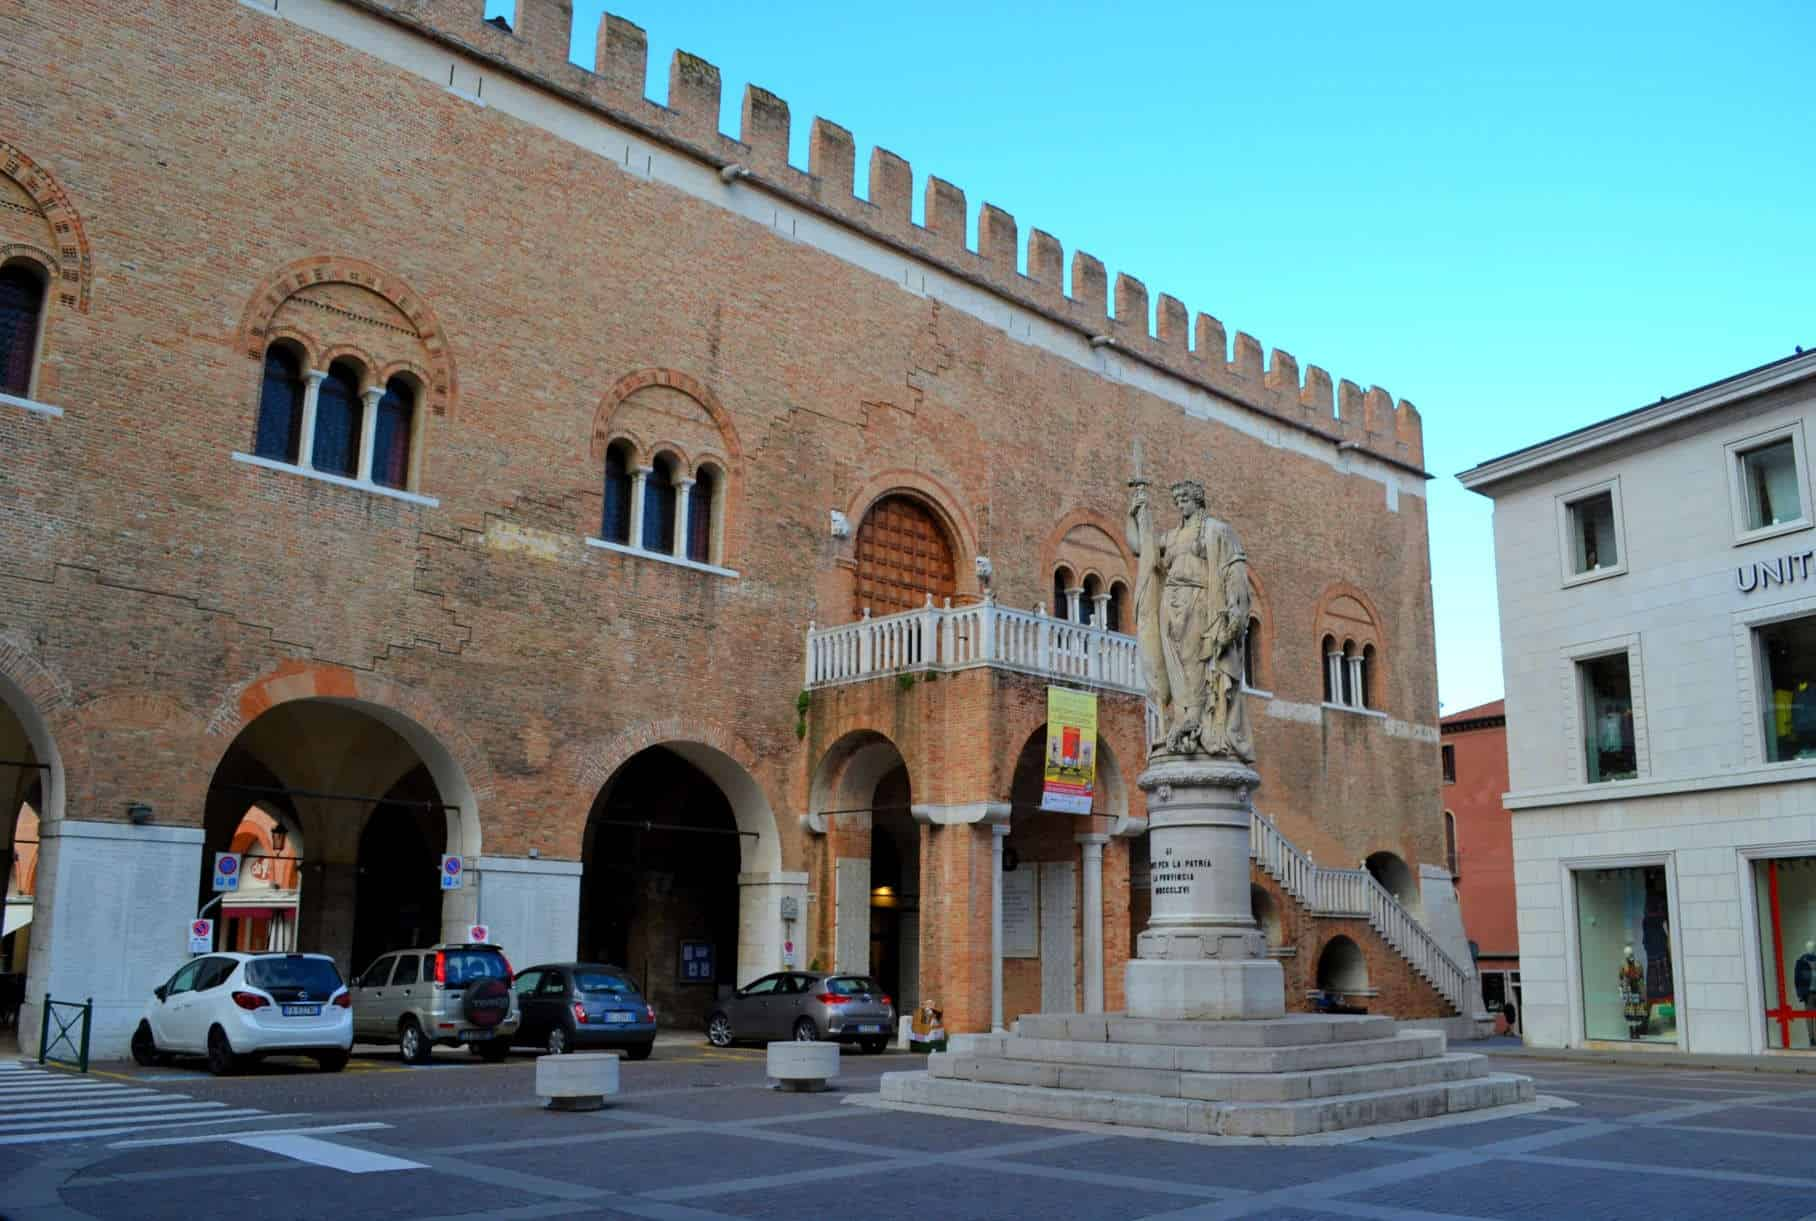 Treviso Piazza Indipendenza